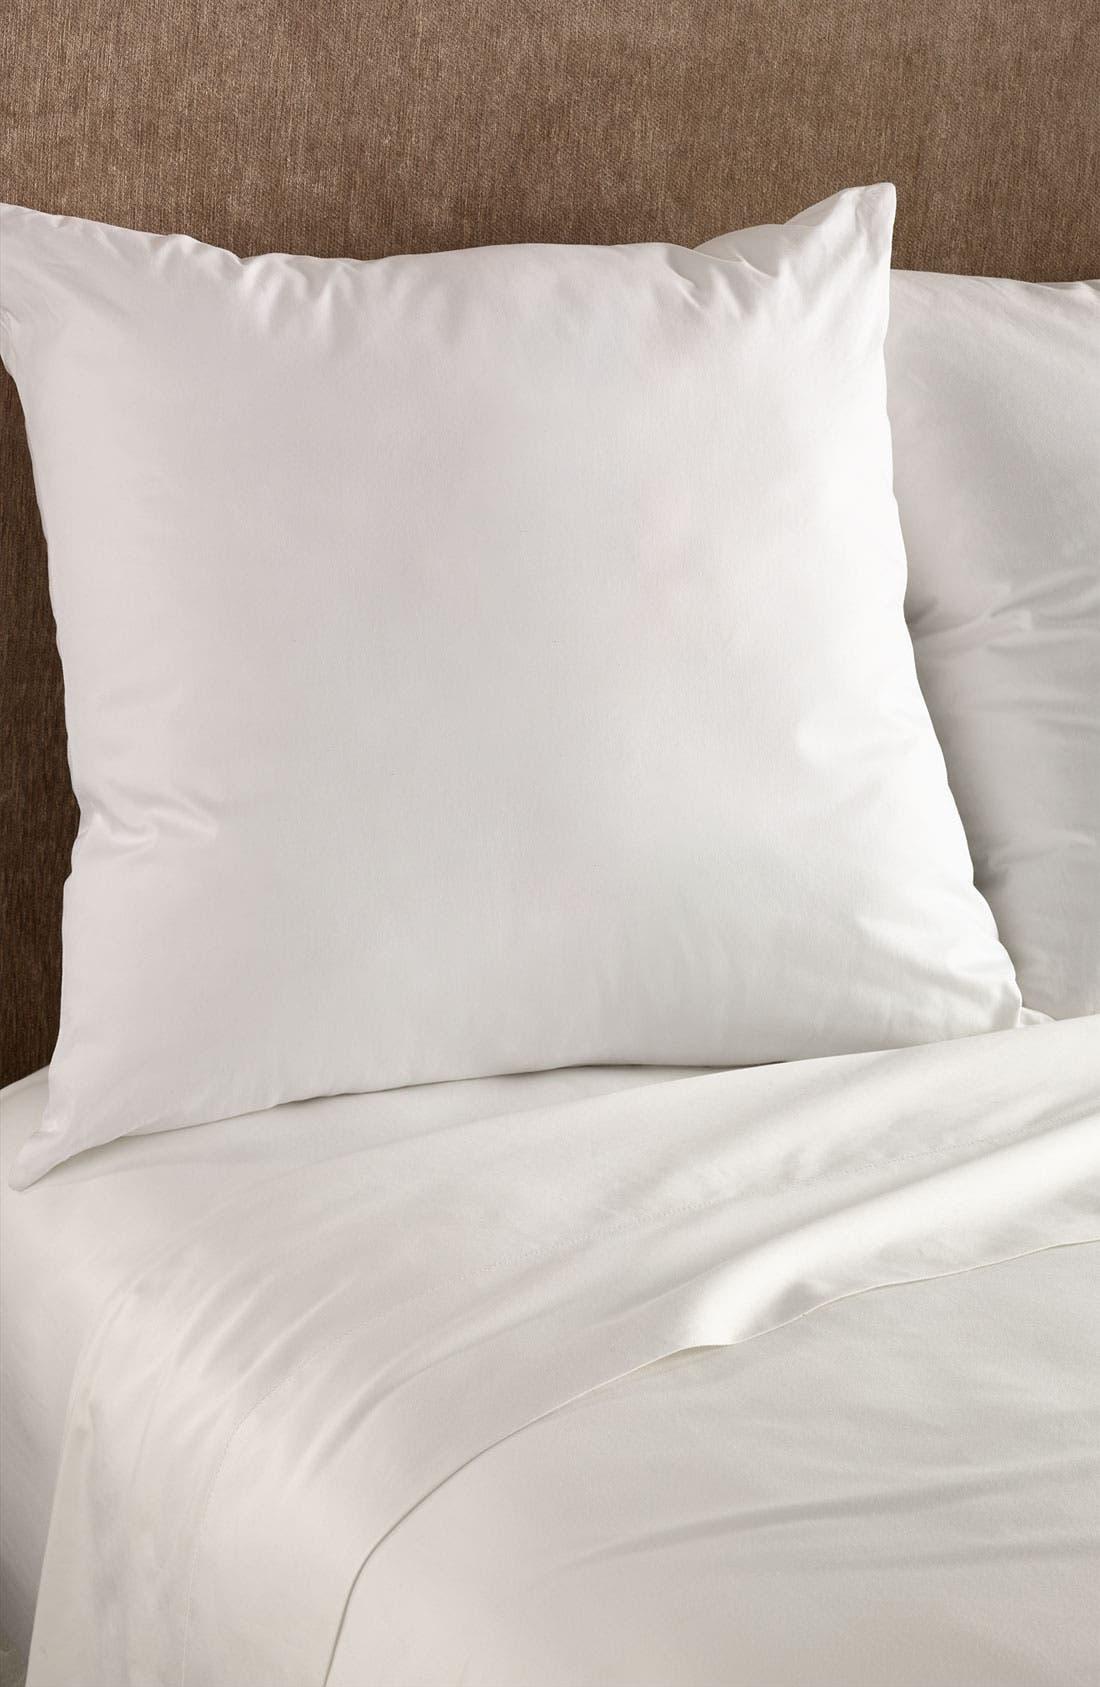 Westin At Home Euro Pillow